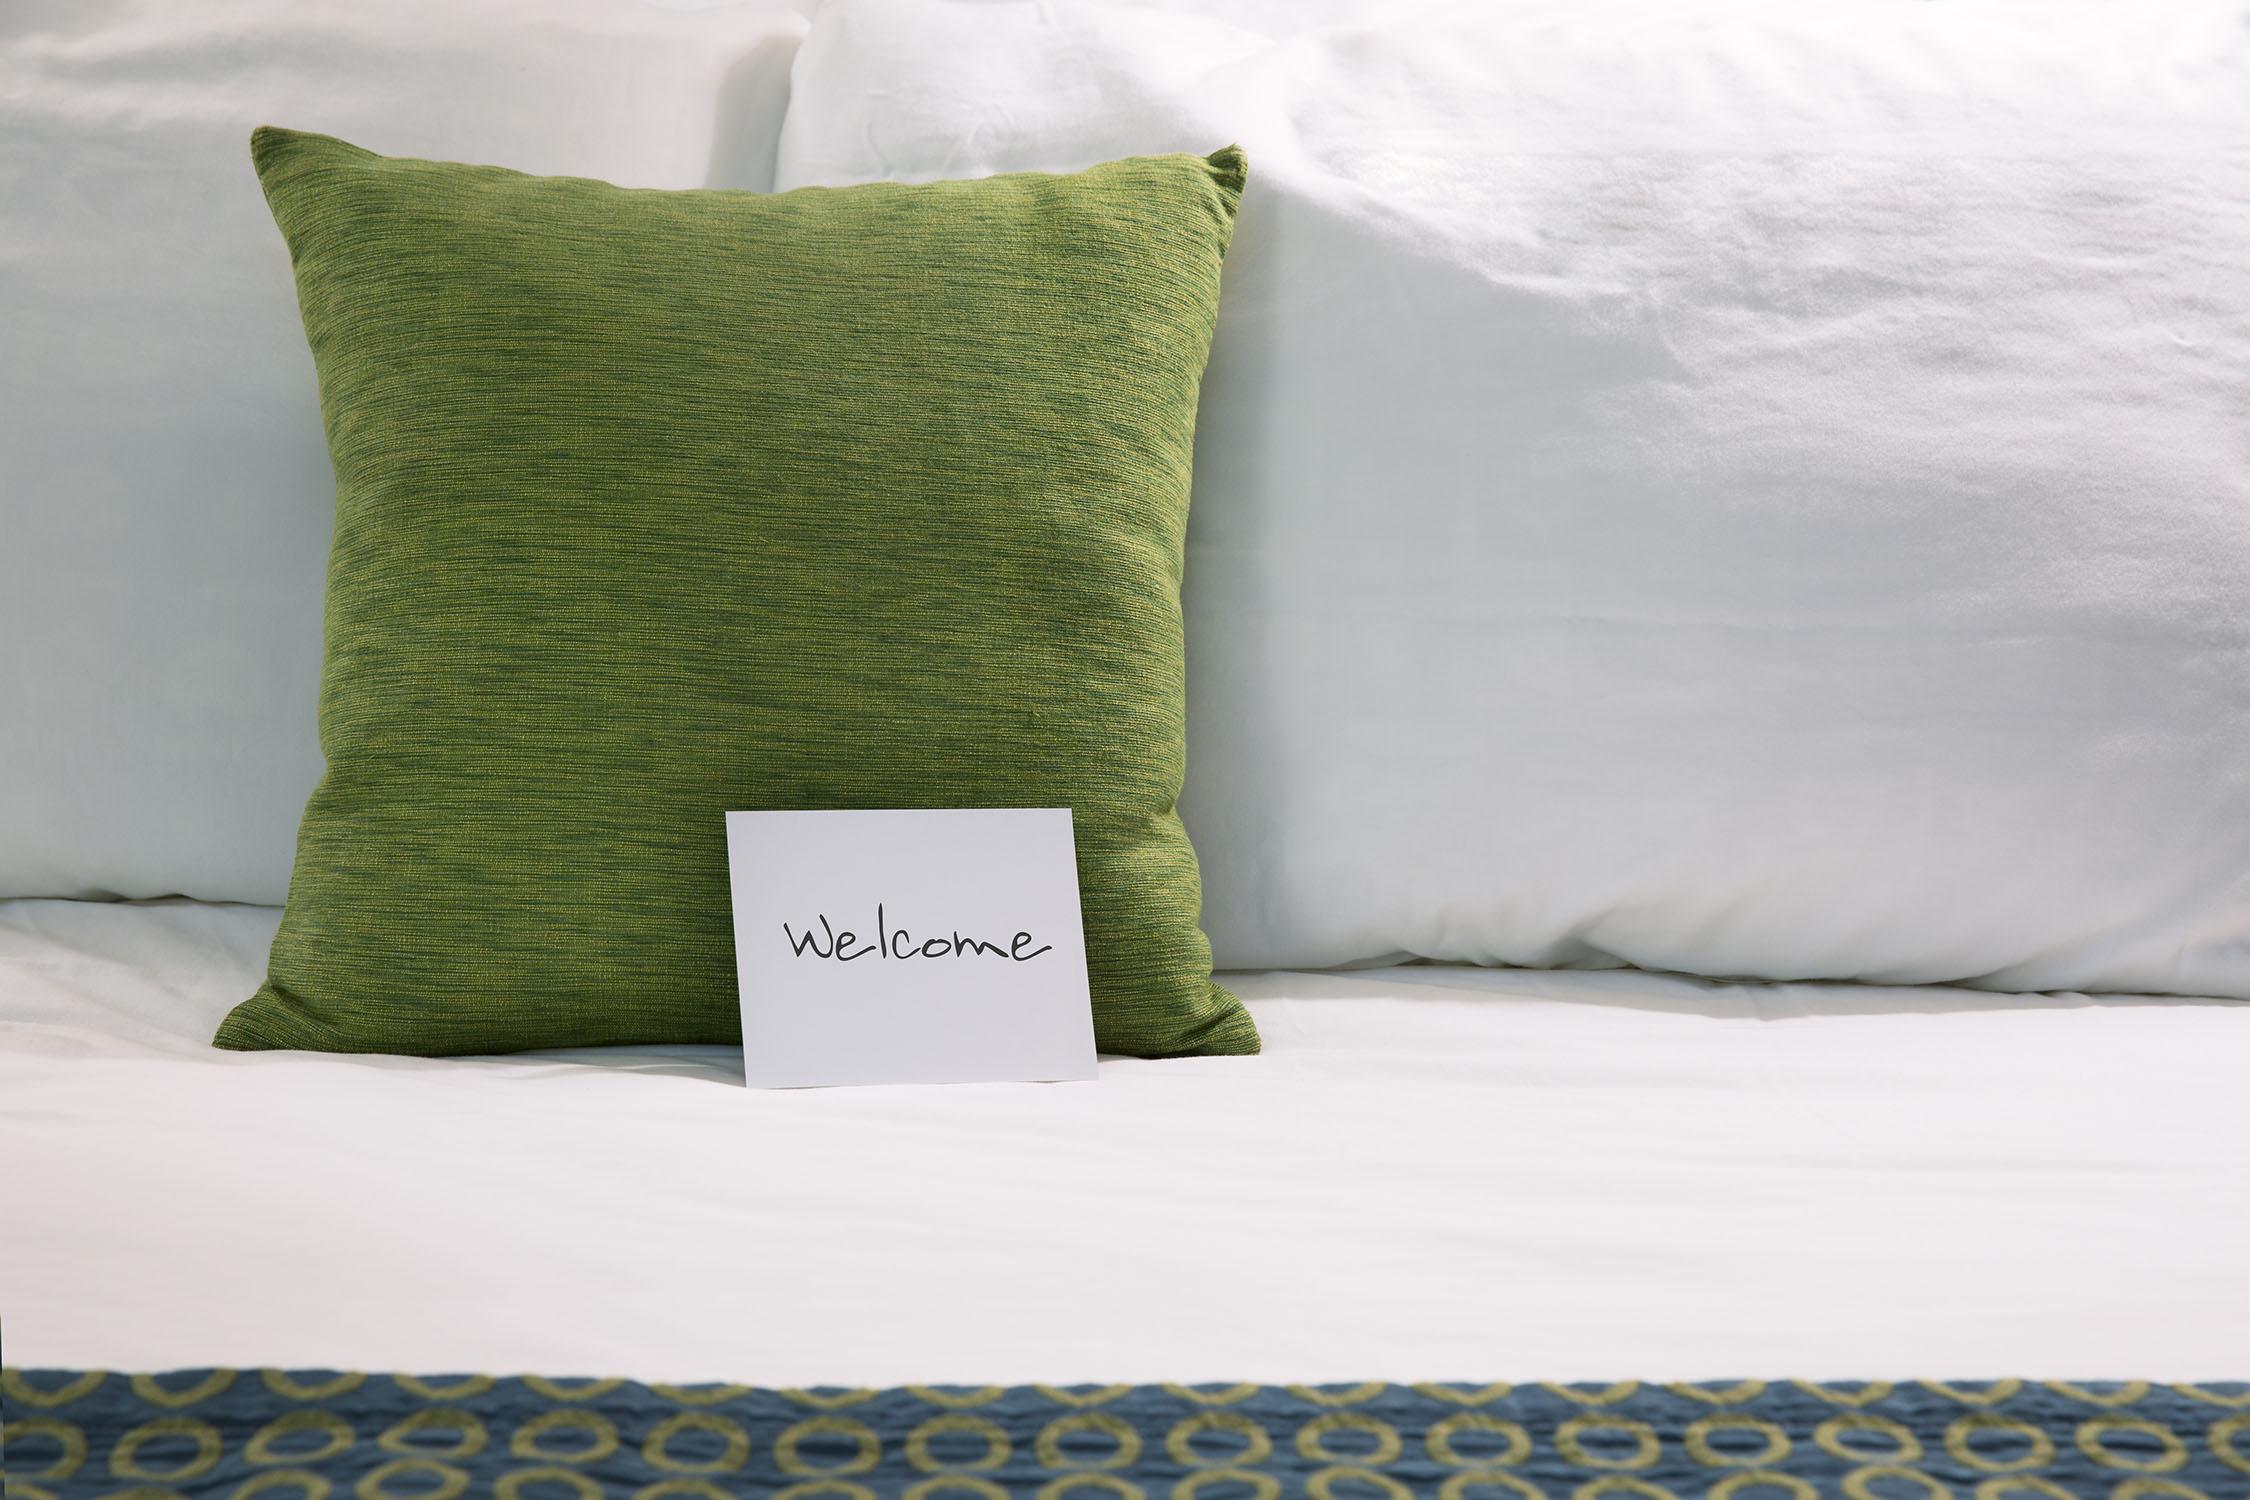 hotel shutterstock_340070393.jpg